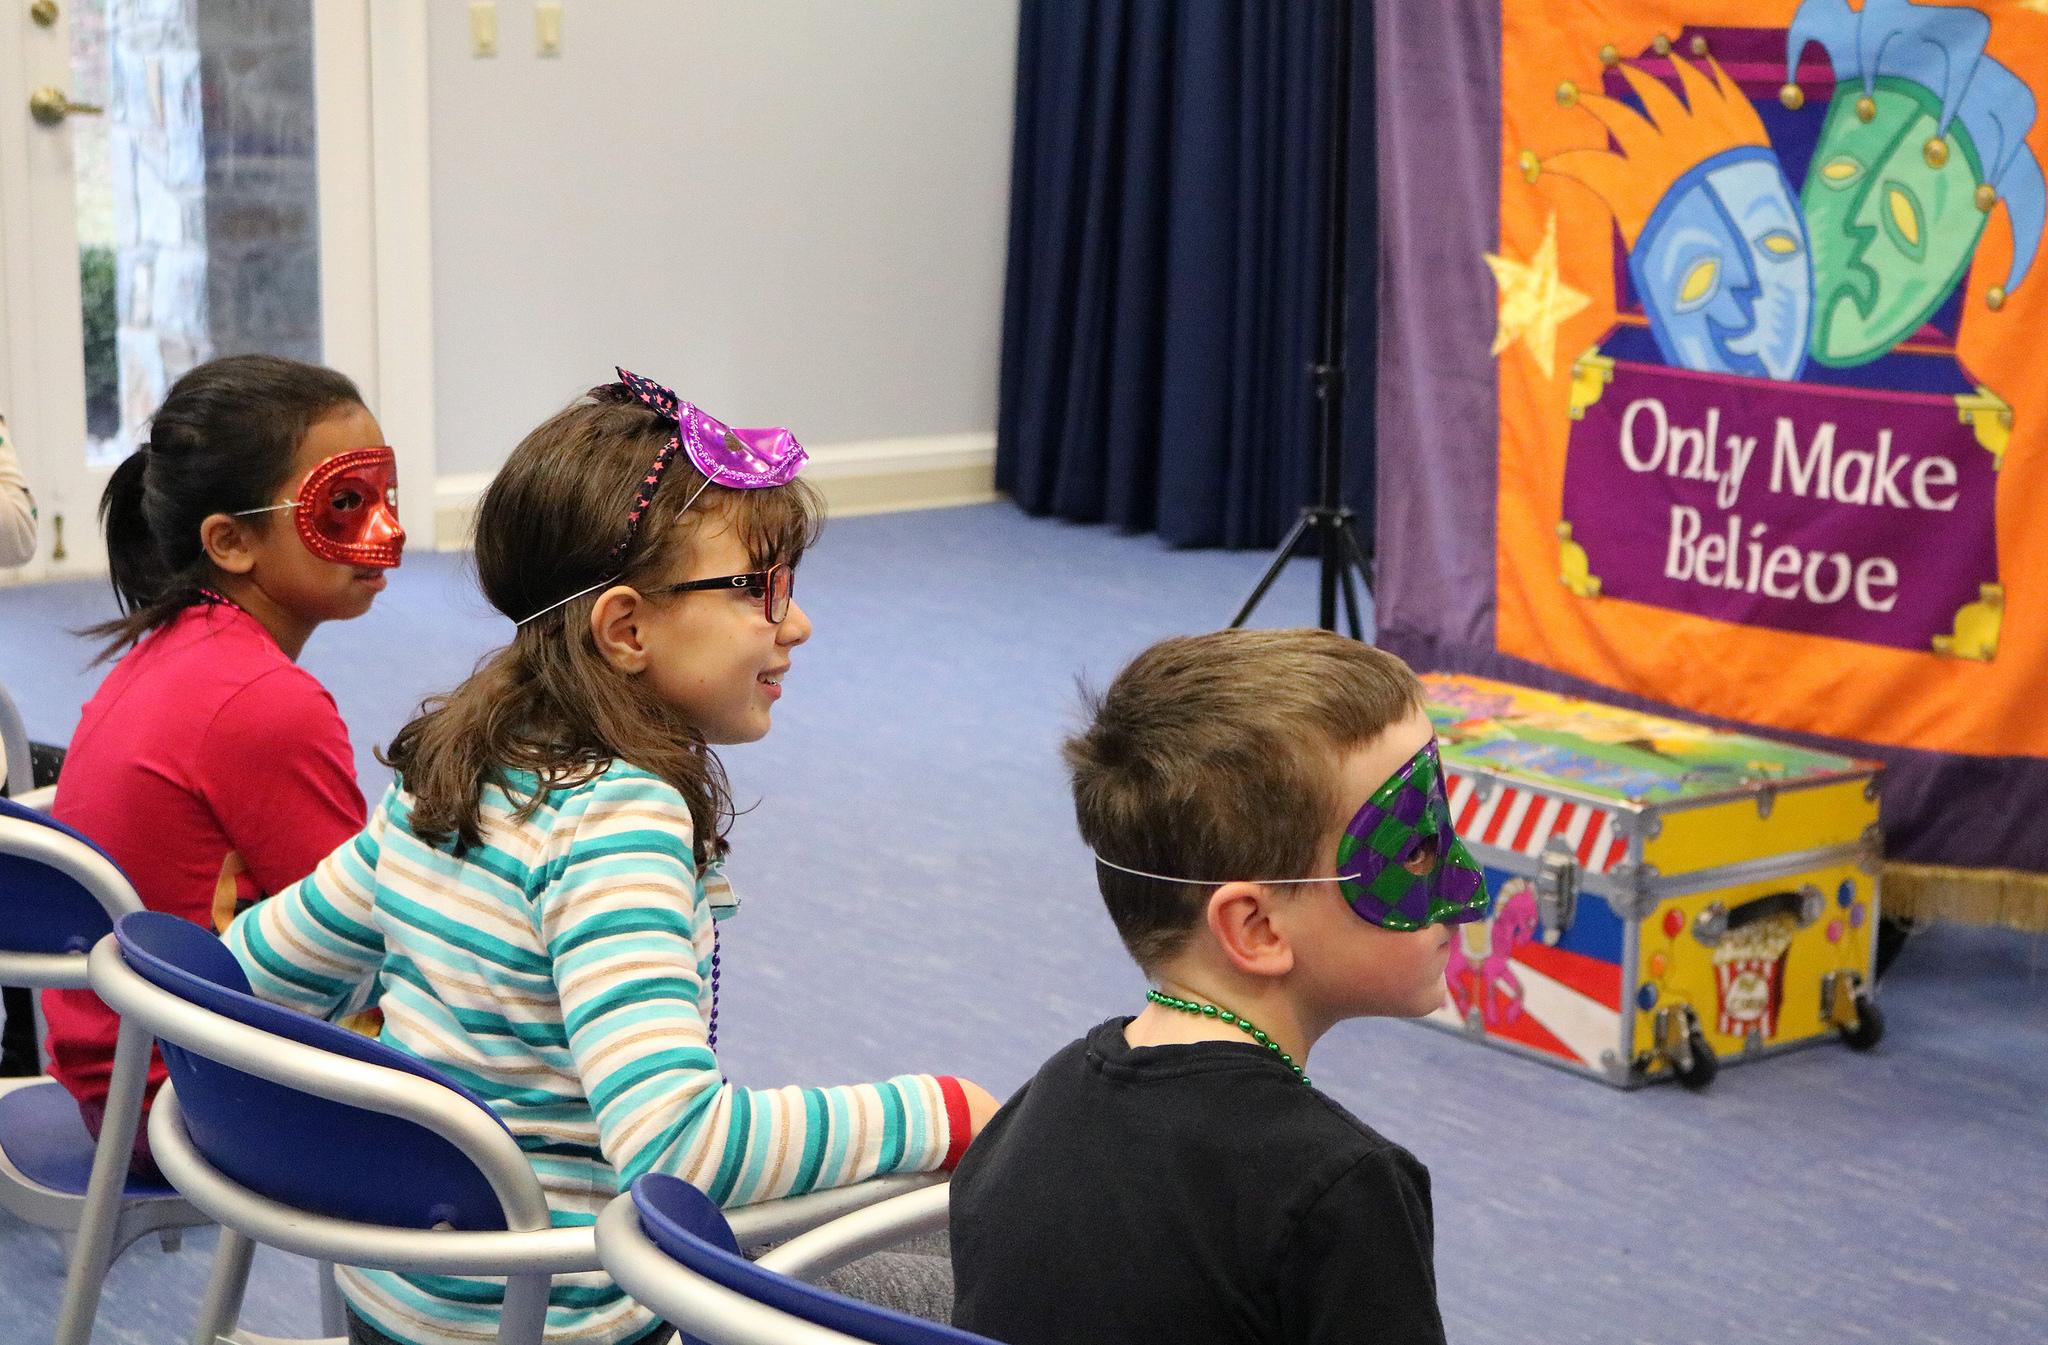 Only Make Believe interactive theater entertains children